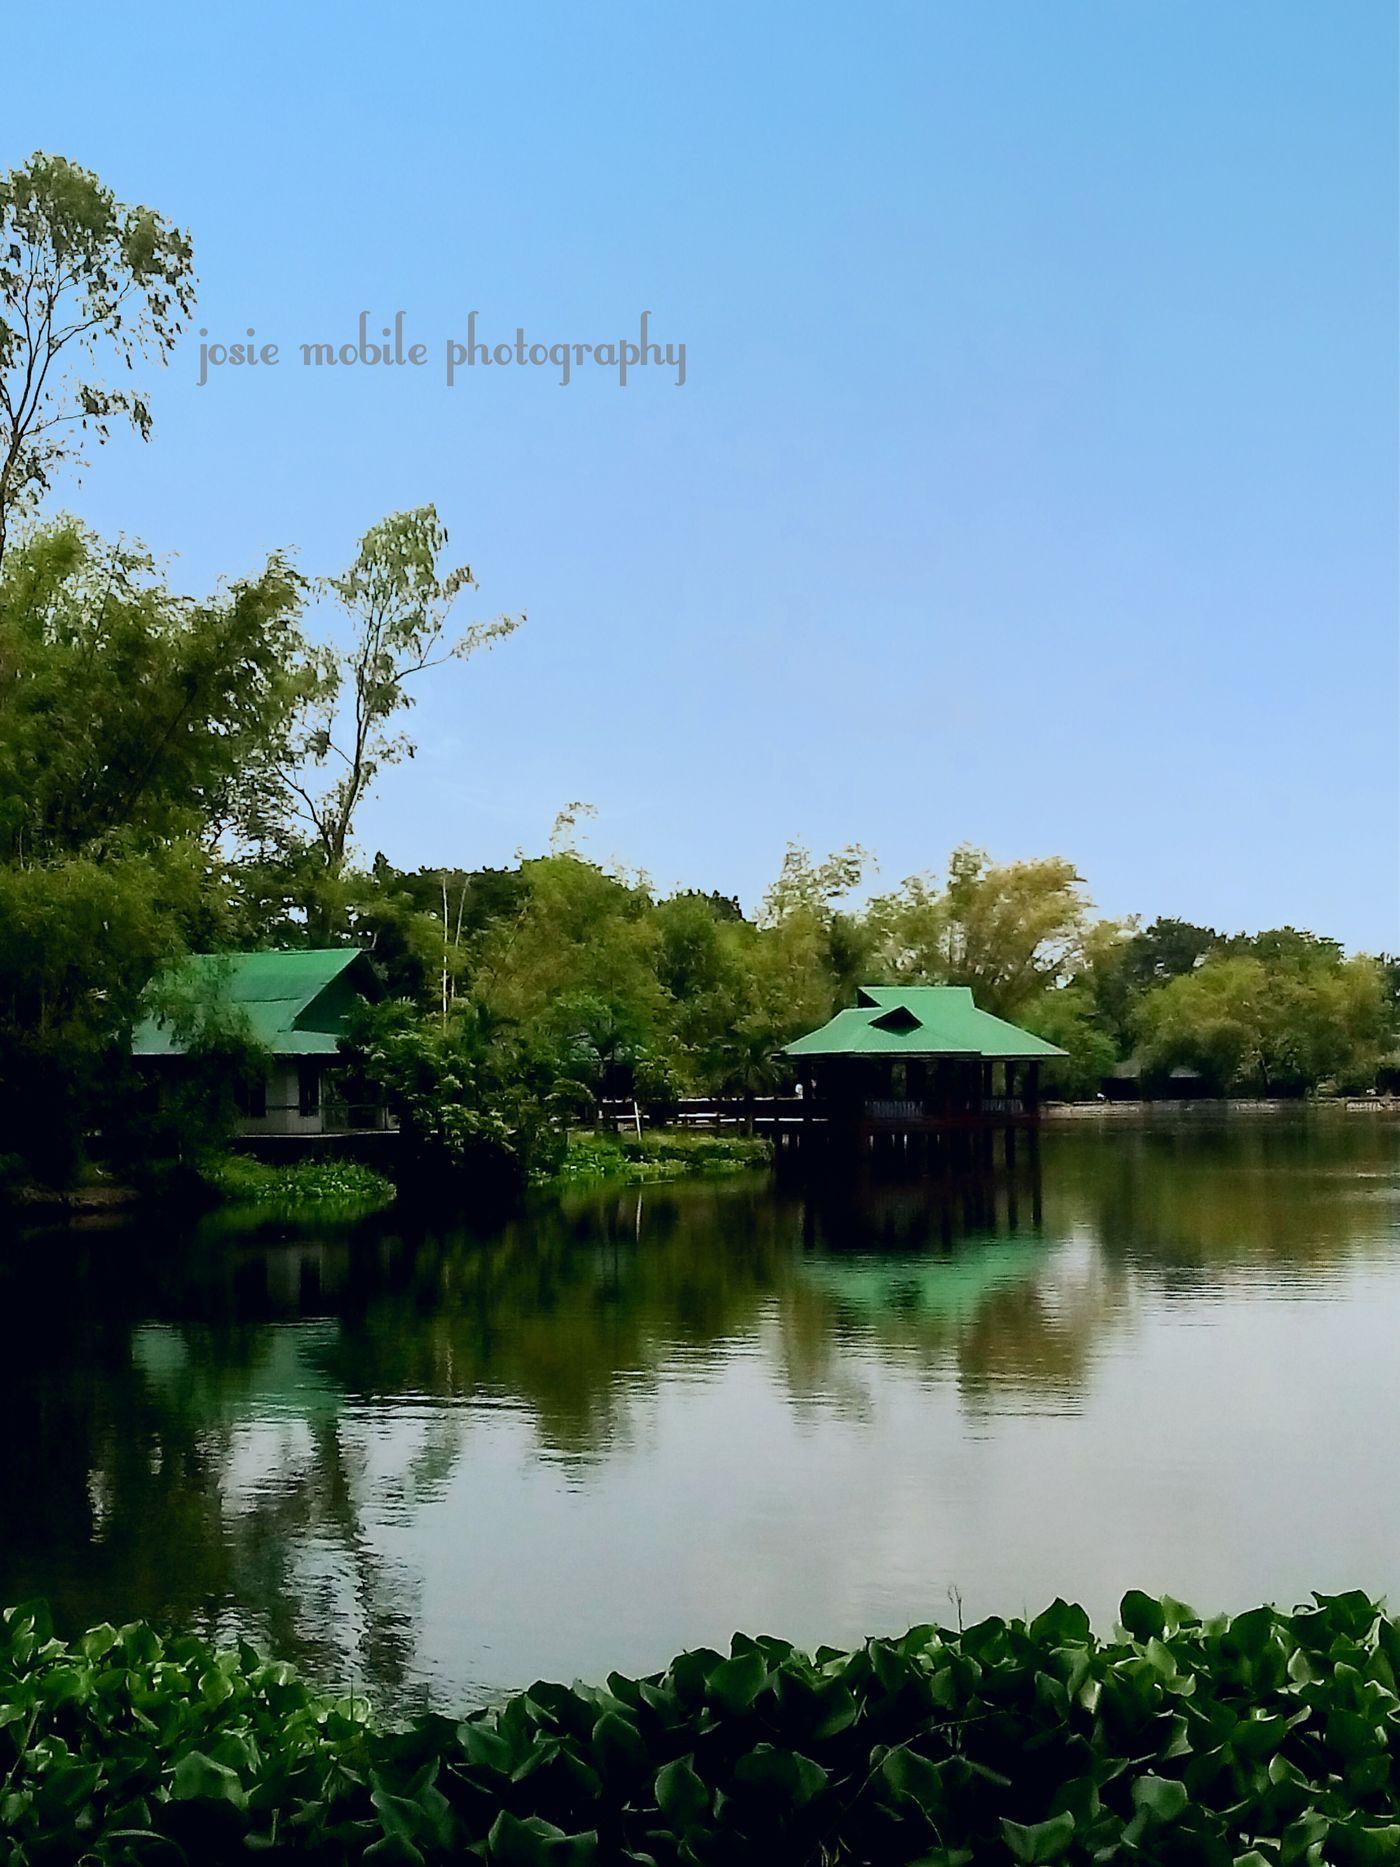 The Calmness Within Eyeem Philippines Mobilephotography Taking Photos EyeEm Landscape Scenery Shots Landscapes